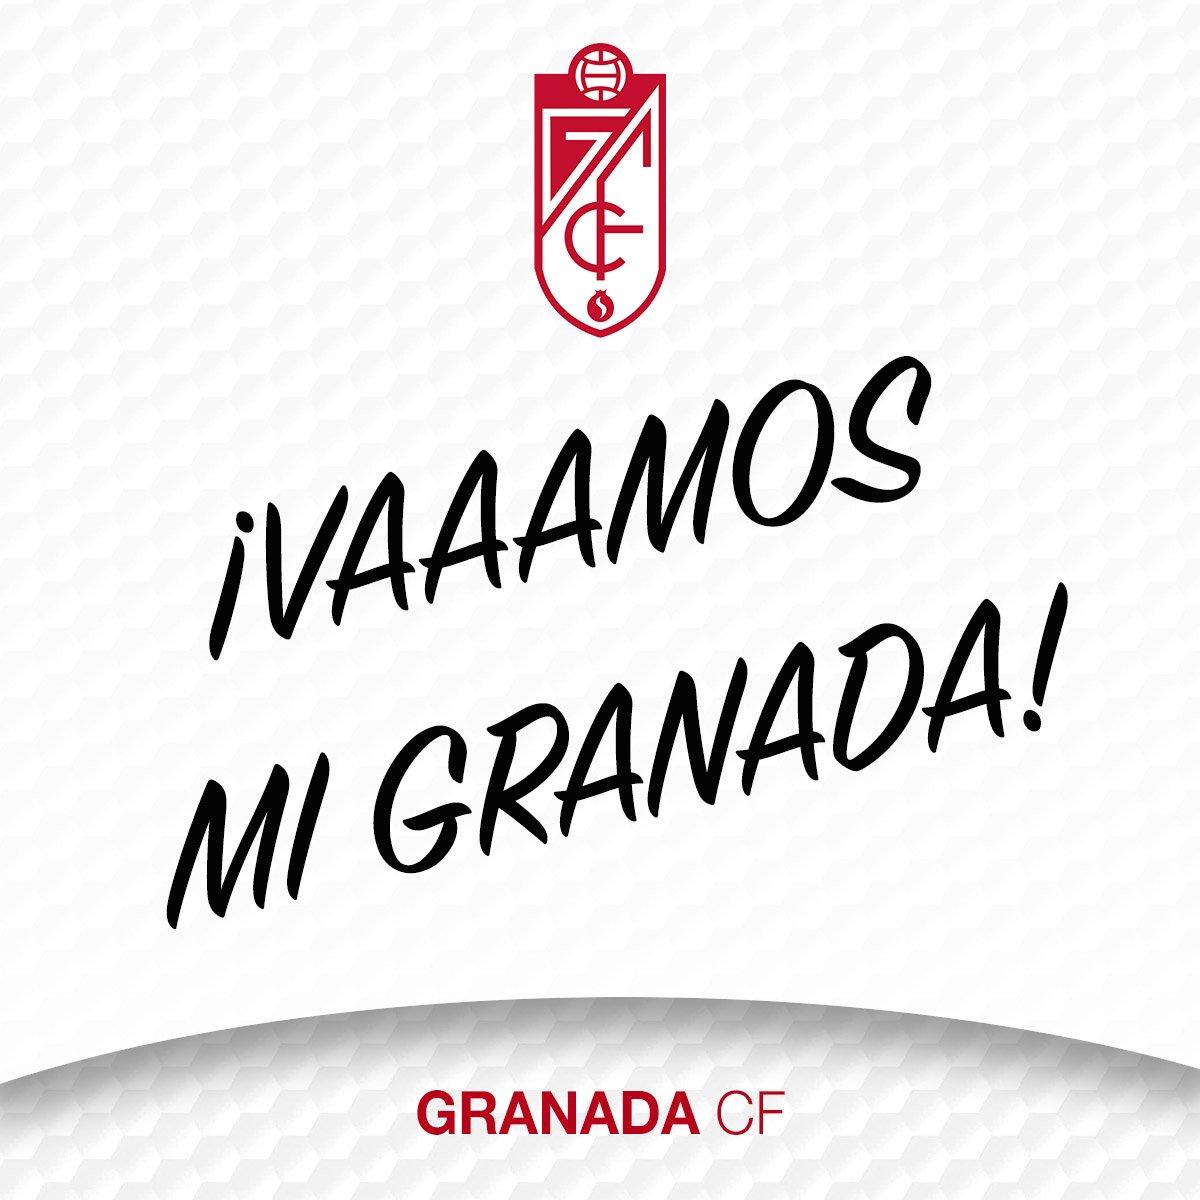 Granada C.F. @GranadaCdeF